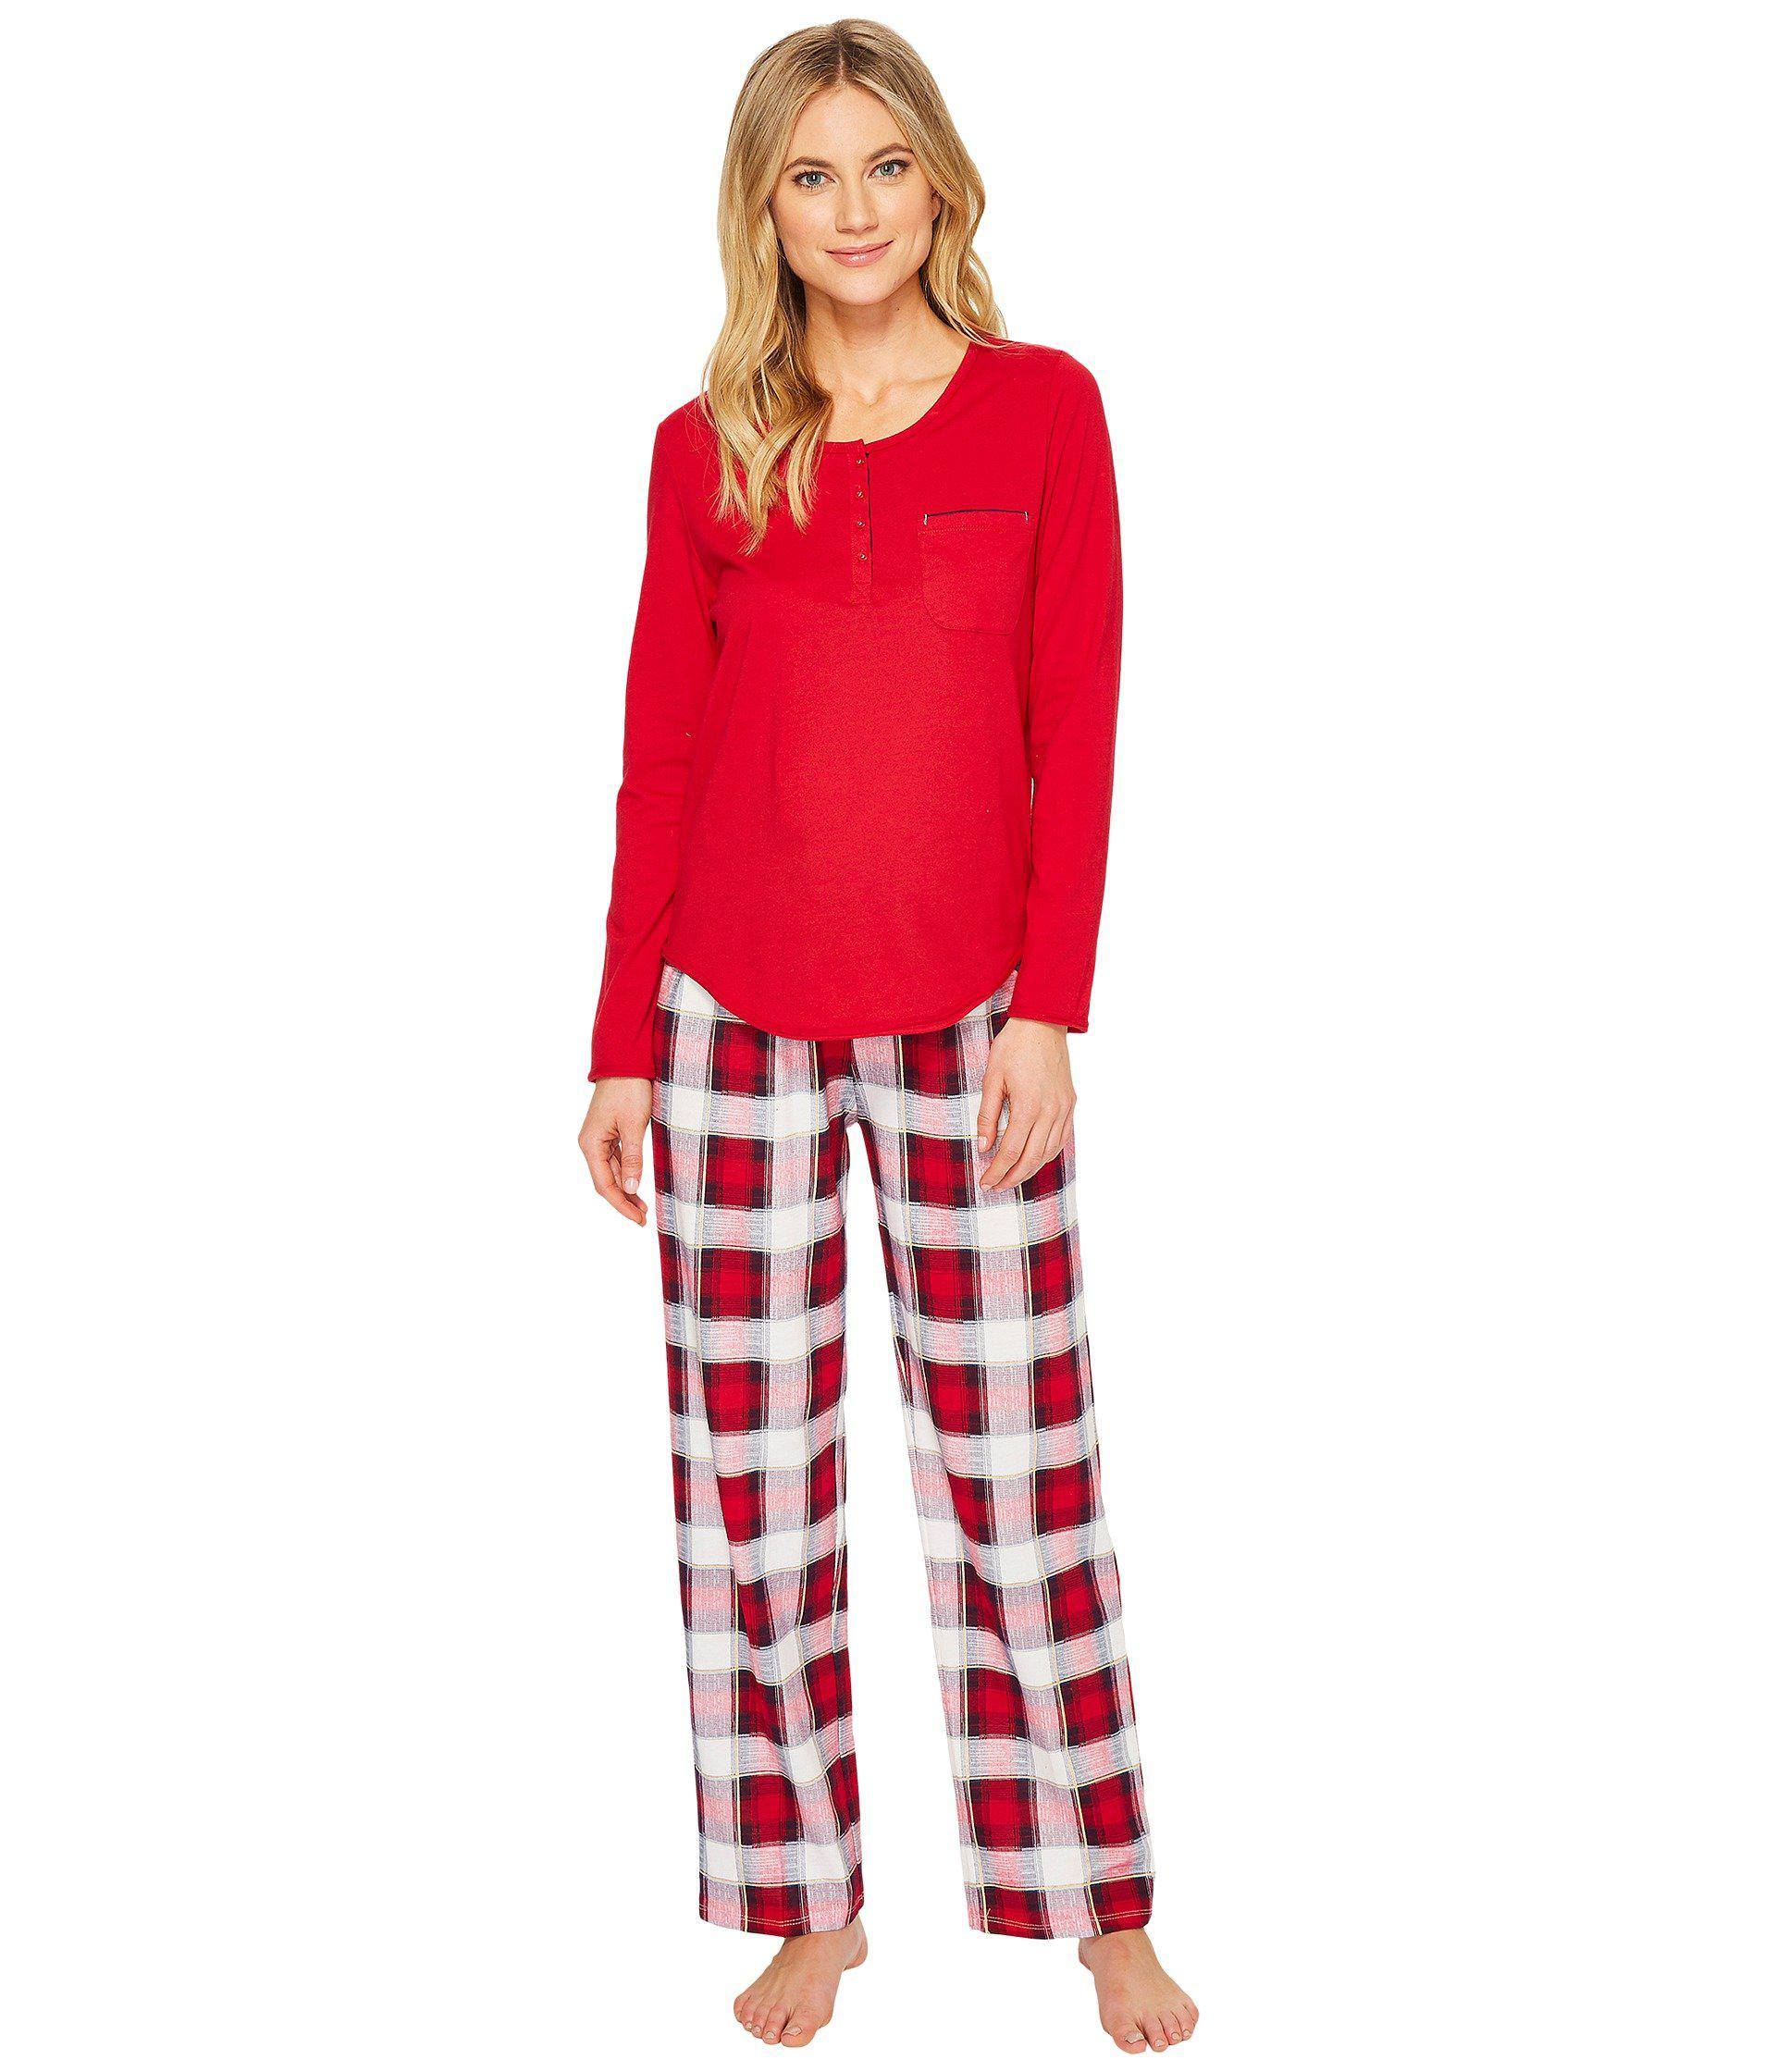 3588d43ac1 Lyst - Jockey Knit Pajama Set in Red